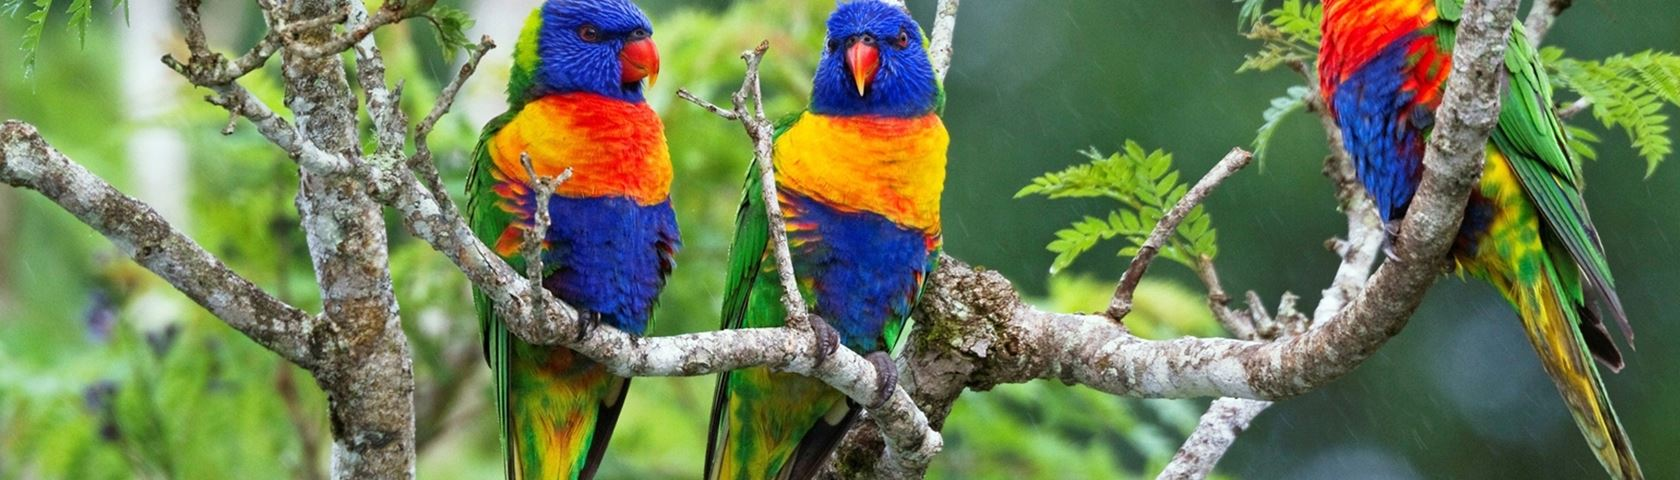 Rainbow Lorakeets